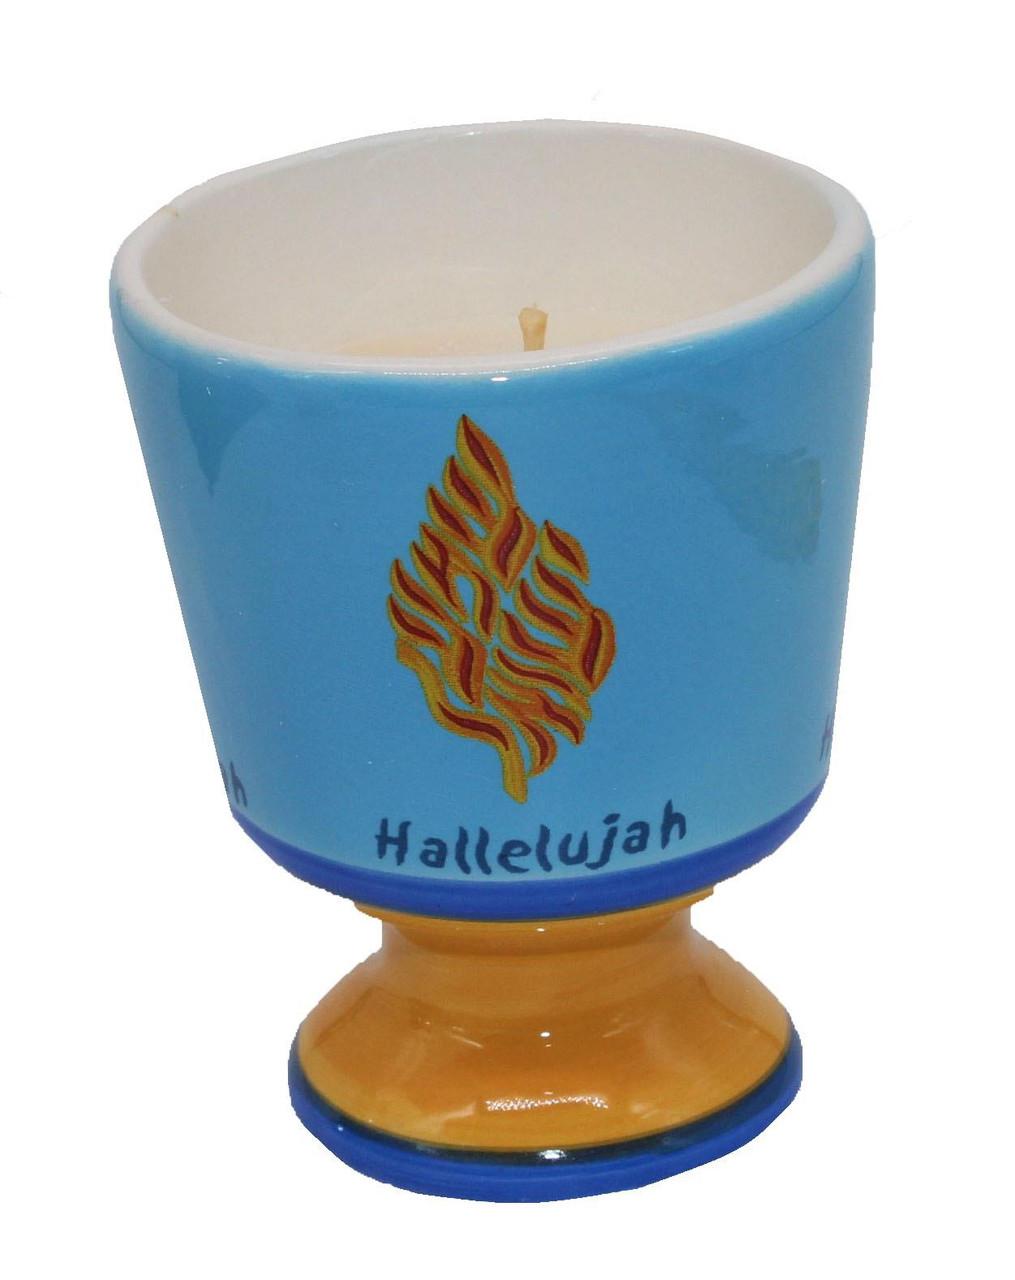 Ceramic Decor Holder Candle Wax Judaica Memorial Shema Israel Hallelujah Holiday